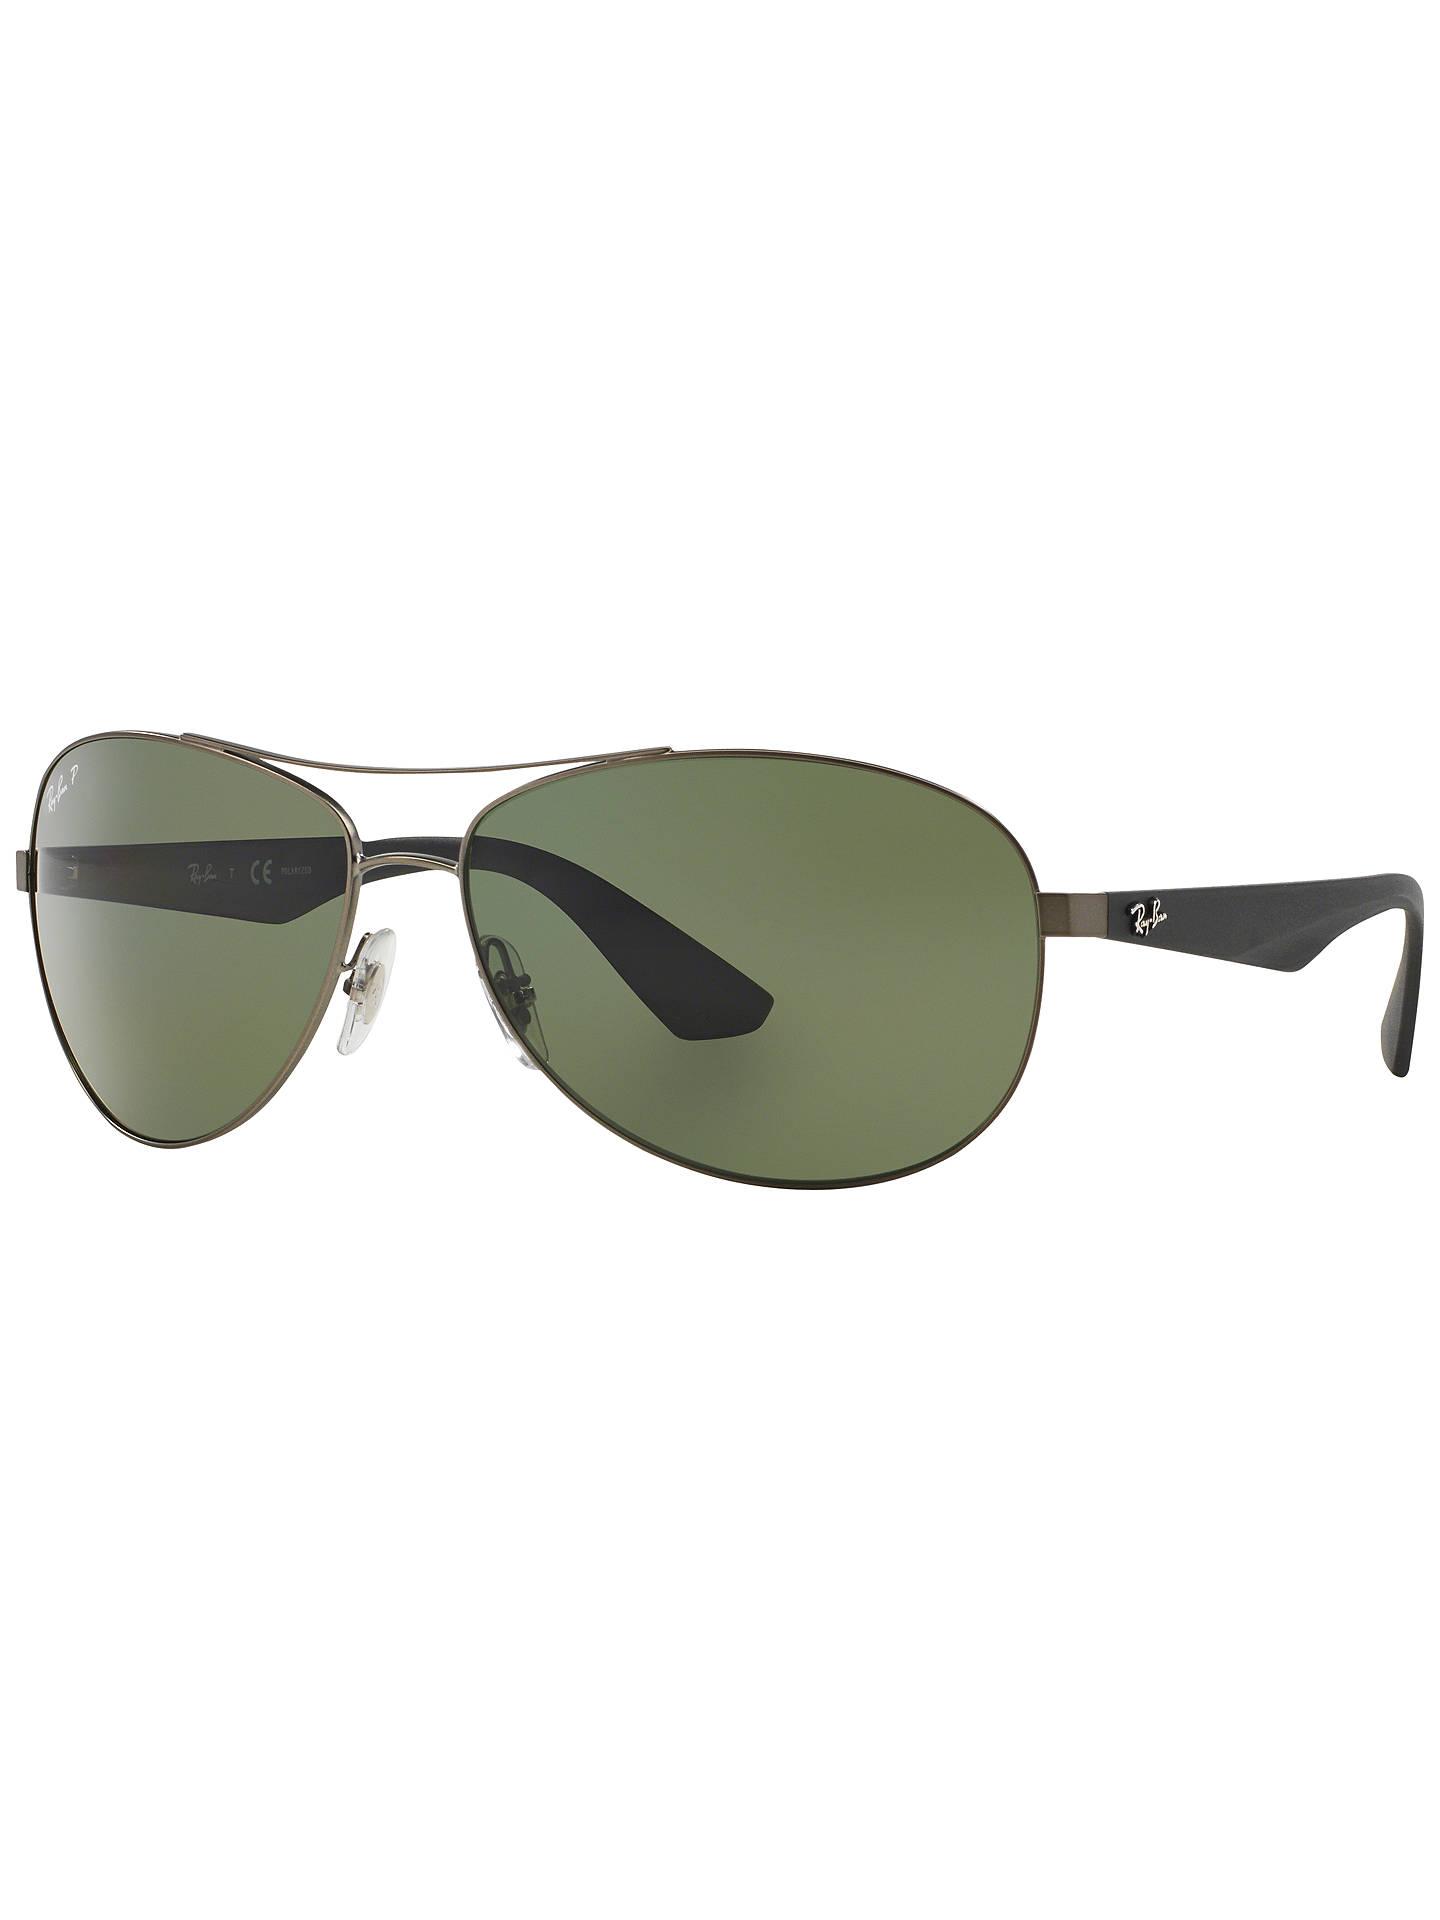 BuyRay-Ban RB3526 Polarised Pilot Sunglasses, Green Online at johnlewis.com  ... 6d8a7466b3